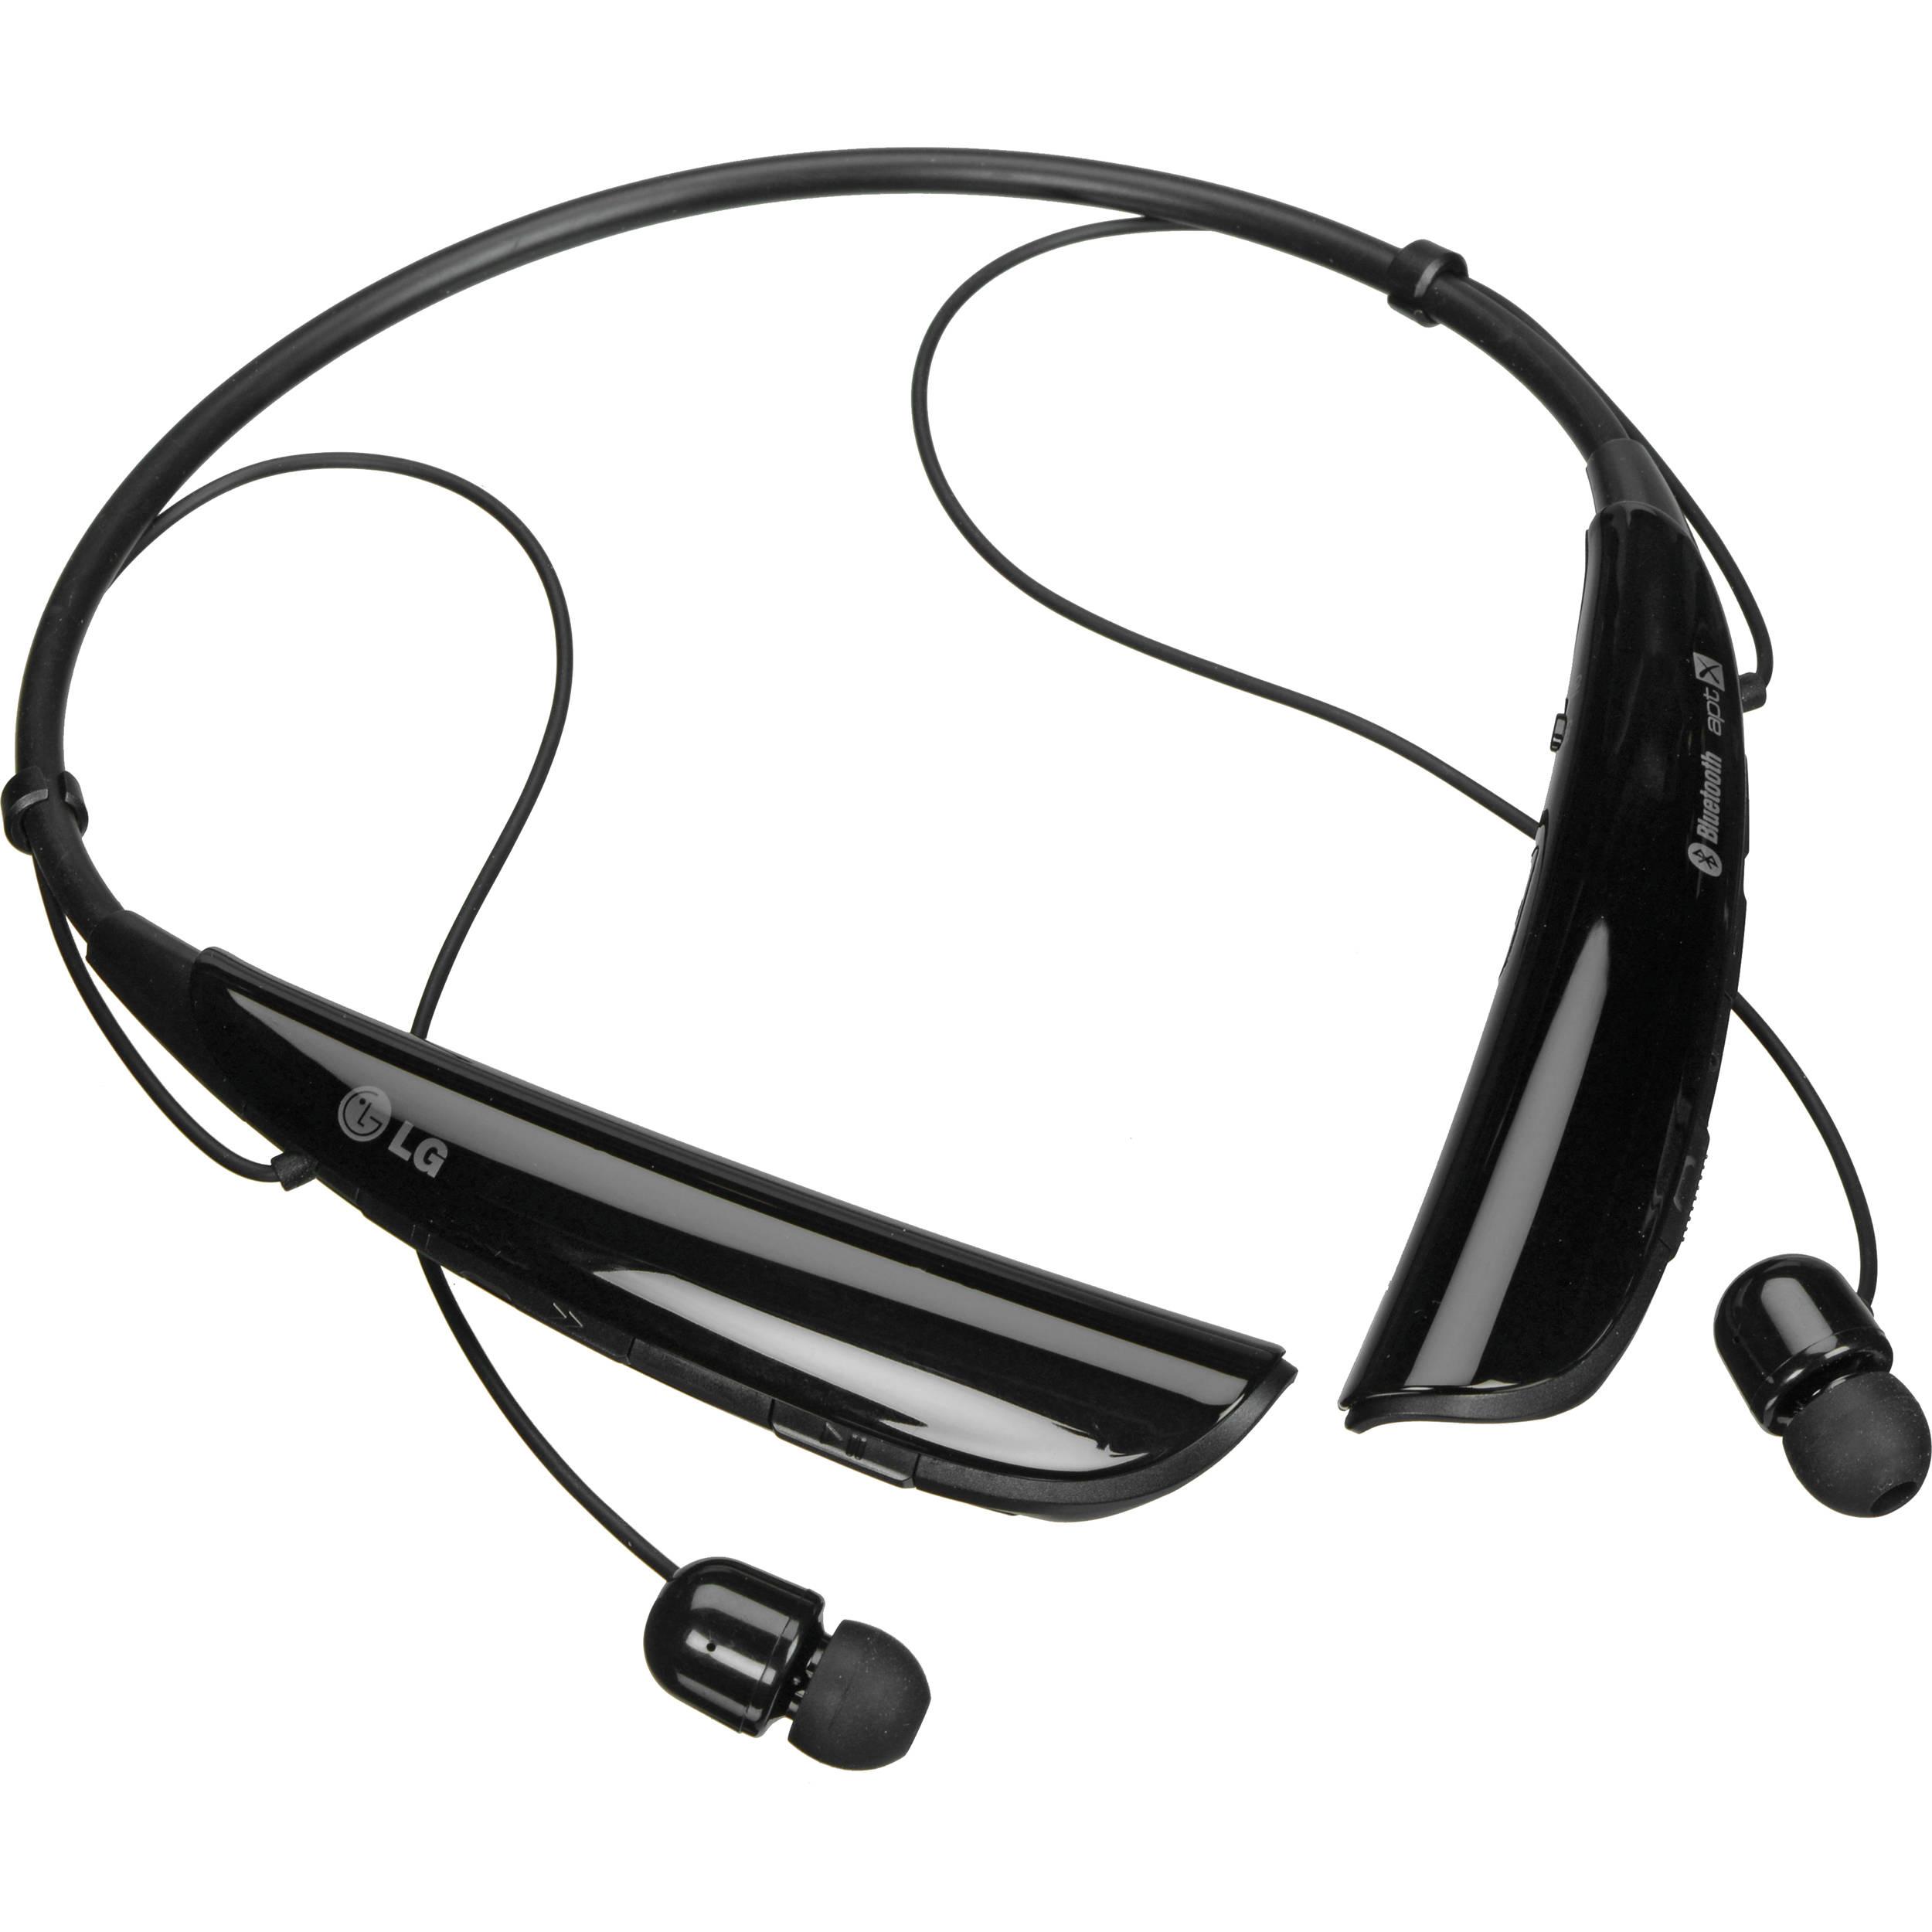 Lg Tone Pro Hbs750 Bluetooth Stereo Headset Hbs 750 Acusbkk B H